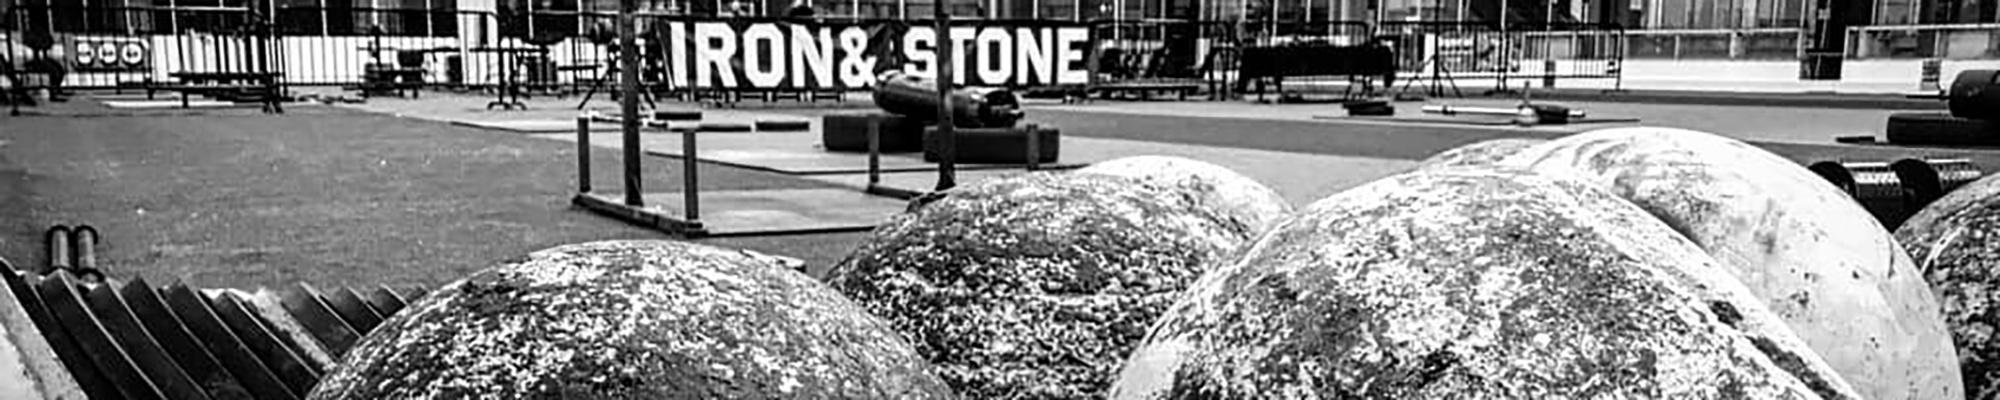 ironandstonestrength Cover